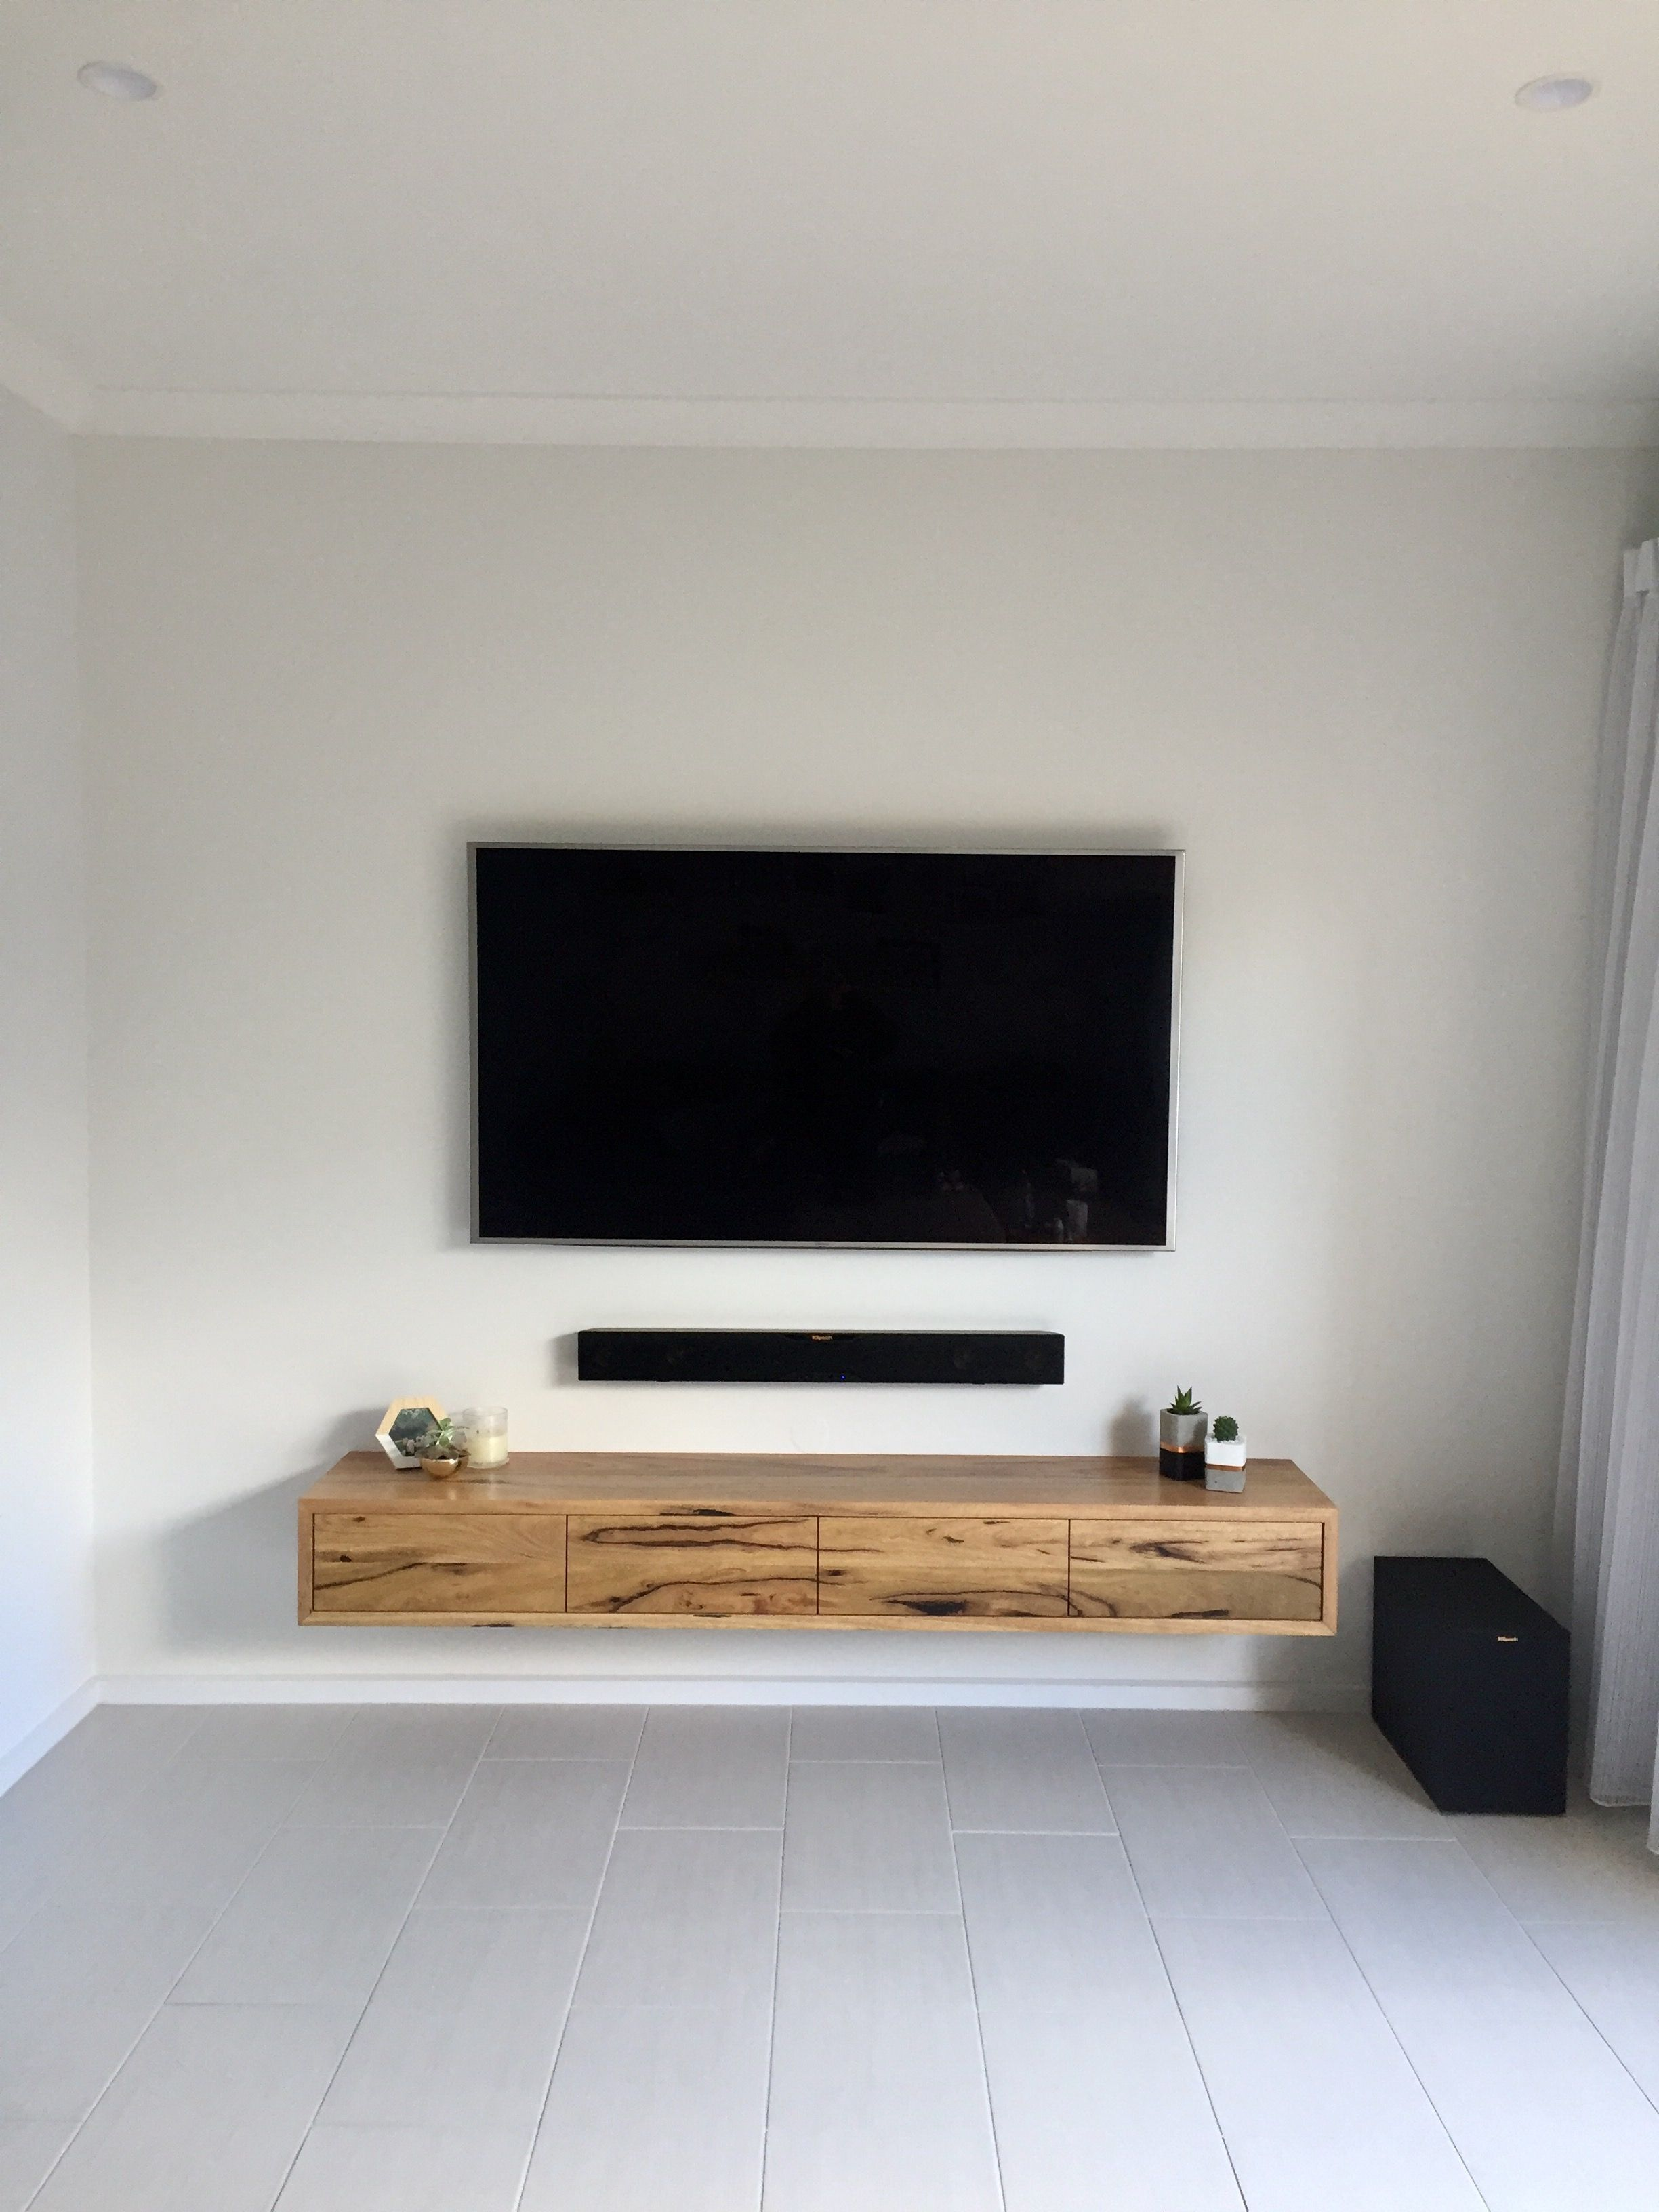 Collie Floating Tv Unit Ingrain Floating Shelves Living Room